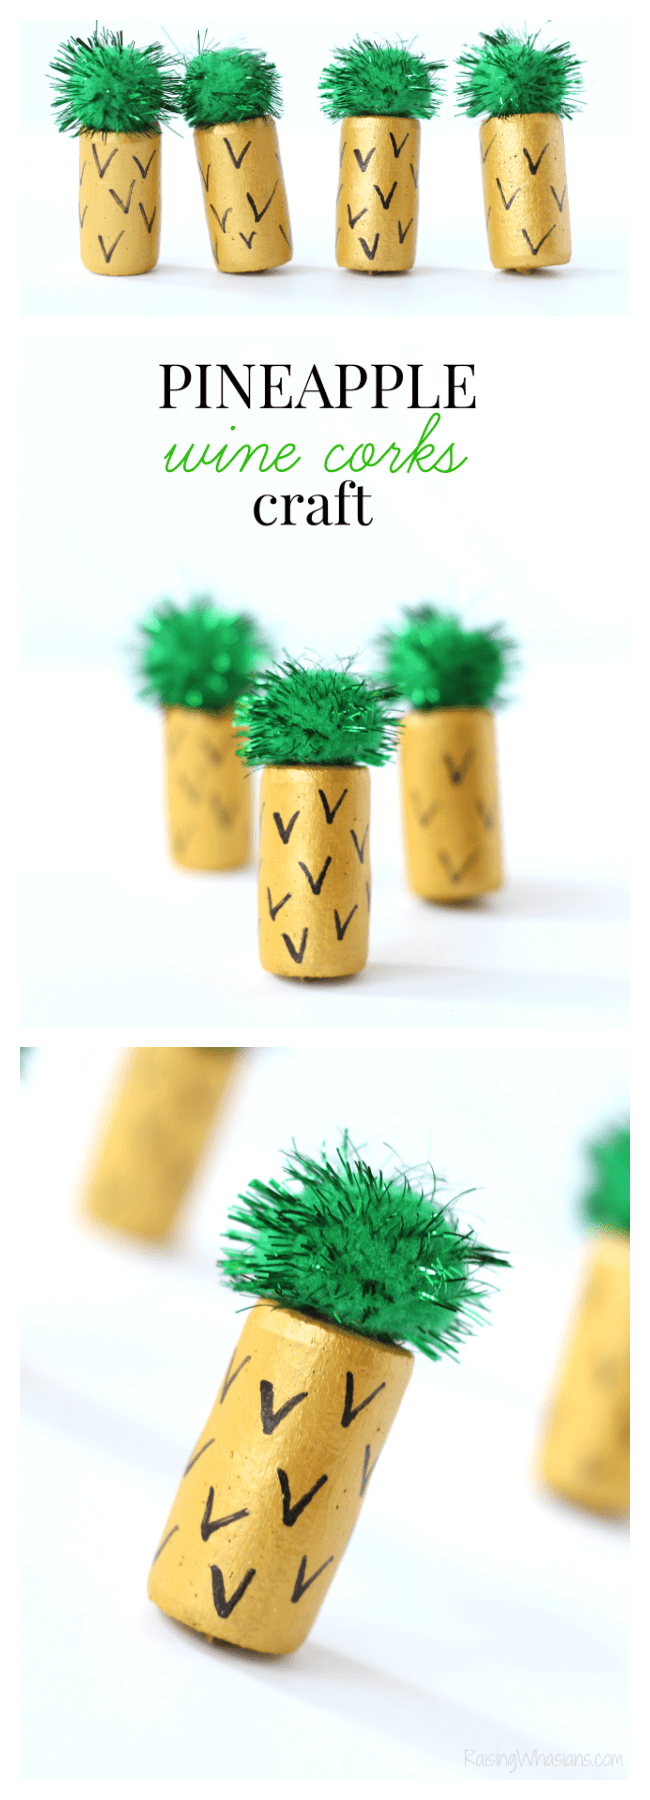 Pineapple wine corks craft pinterest